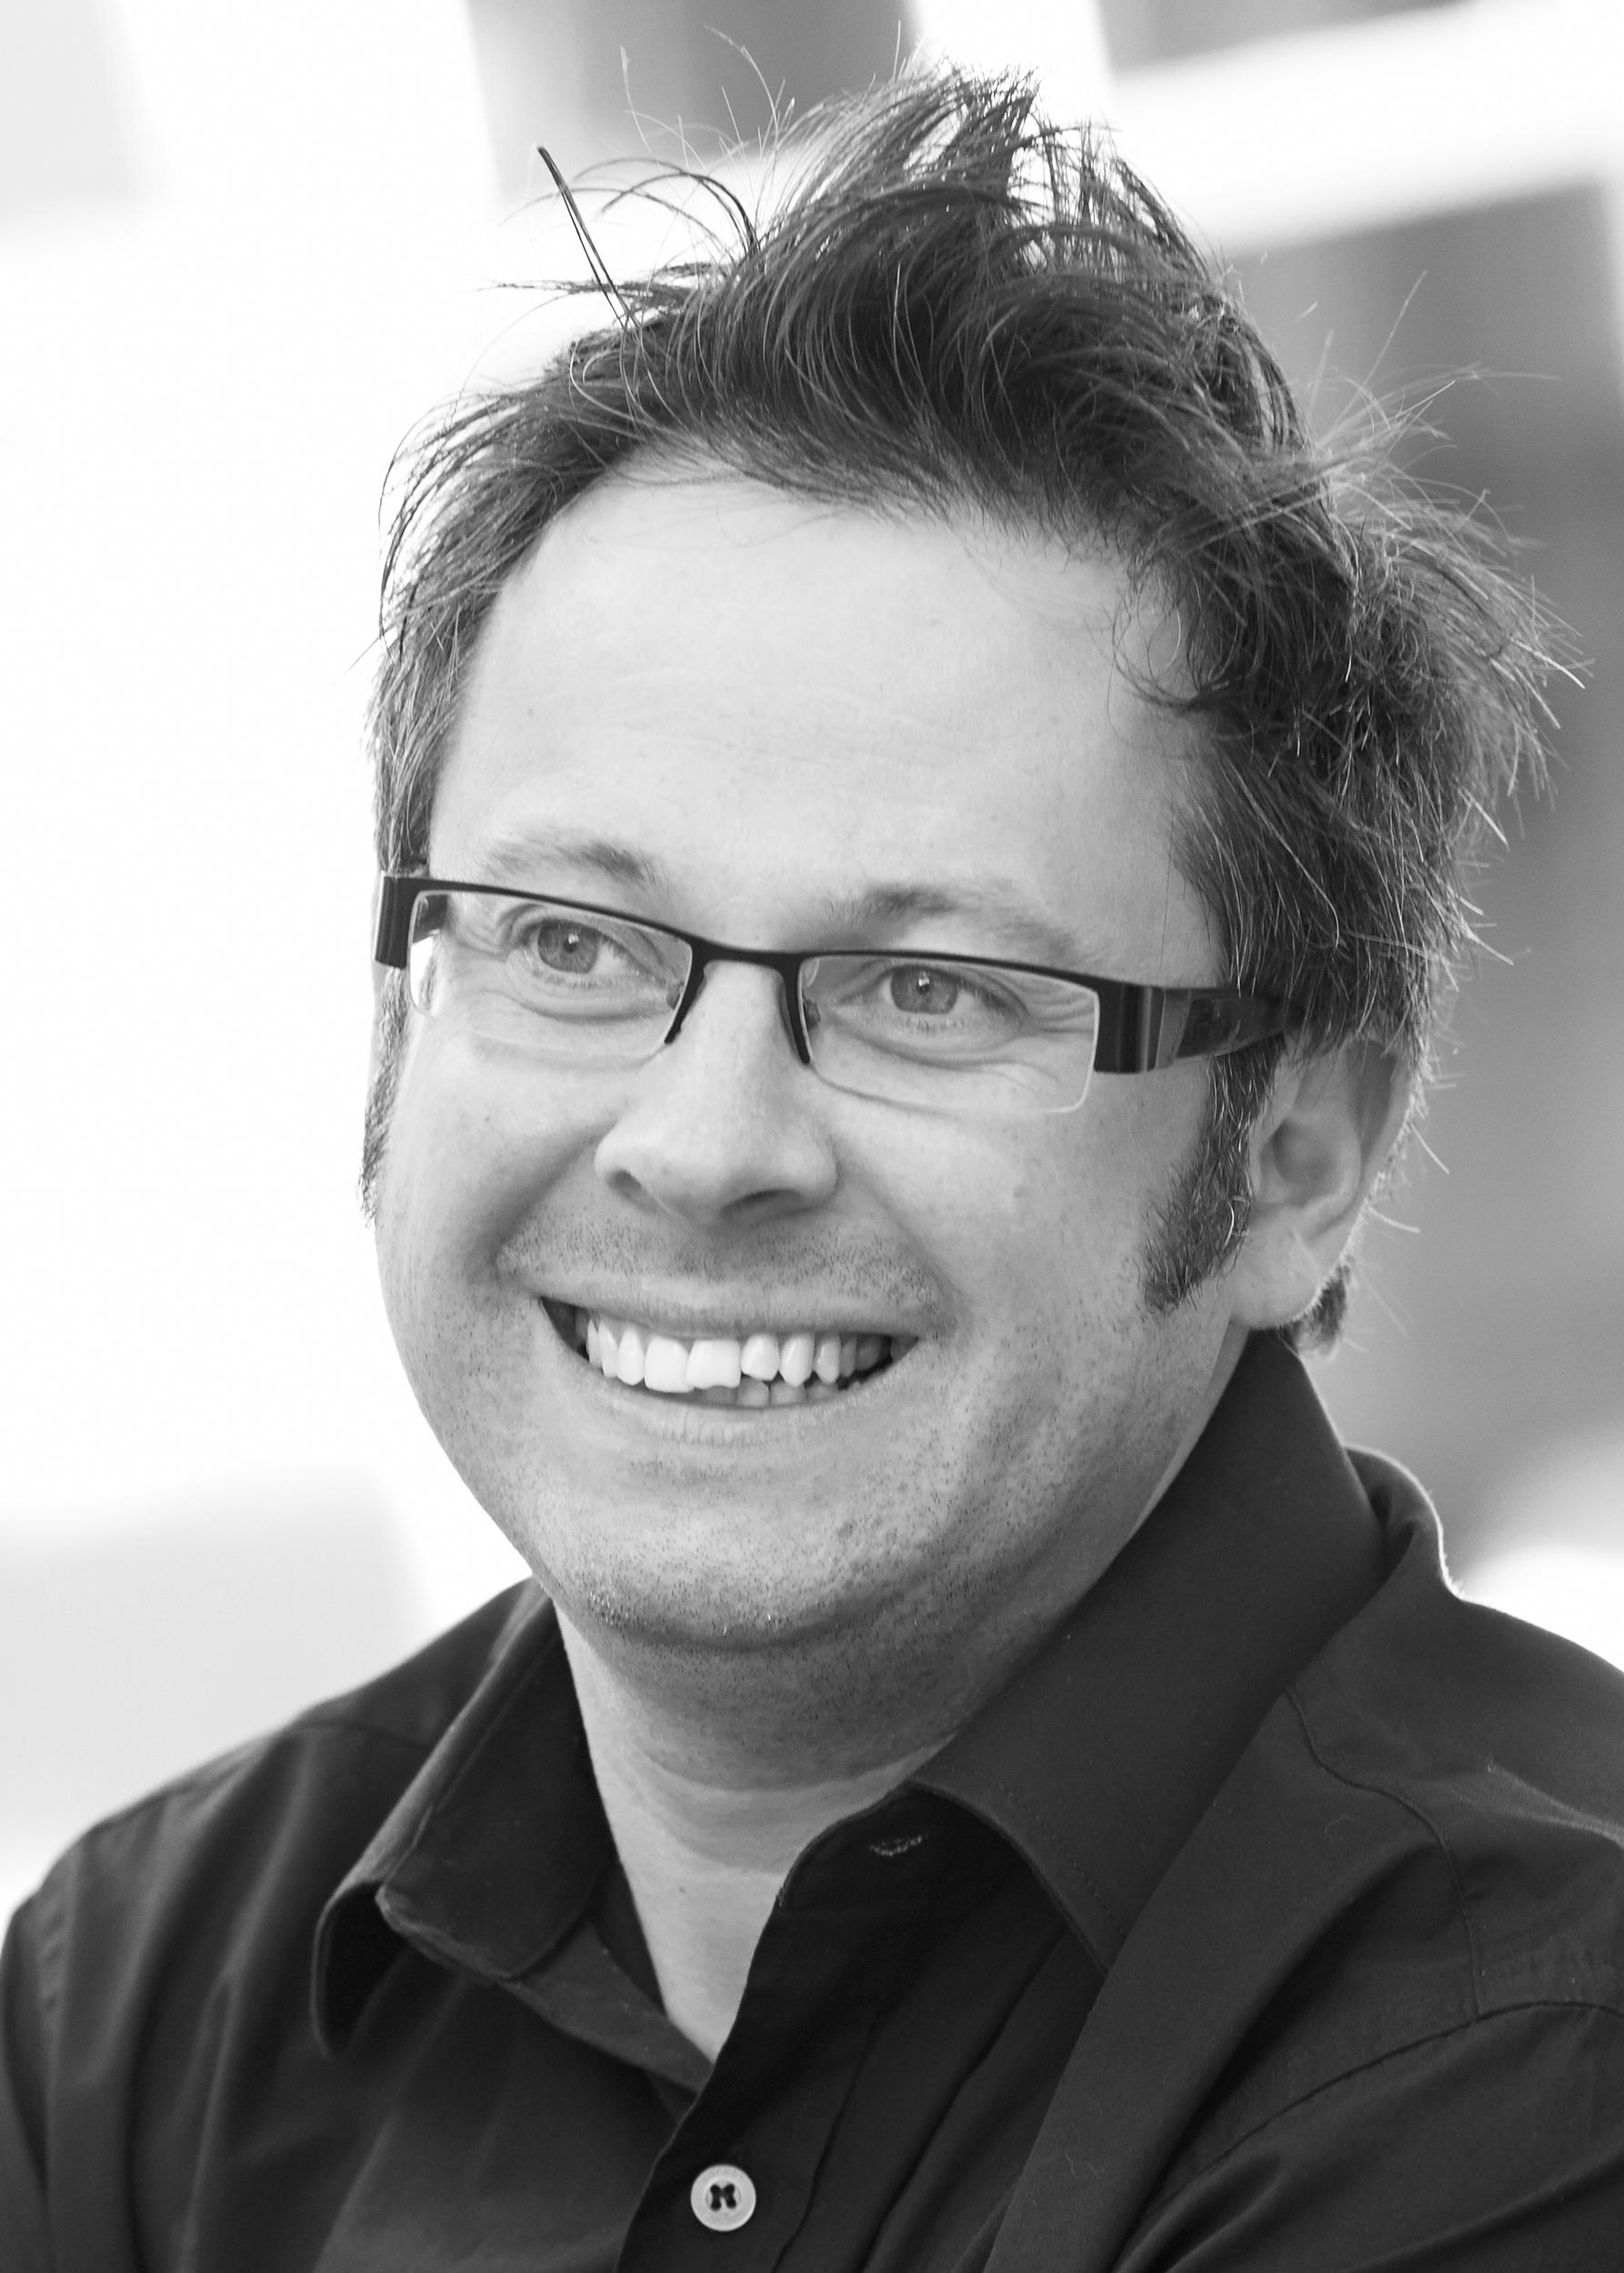 Rob Partridge